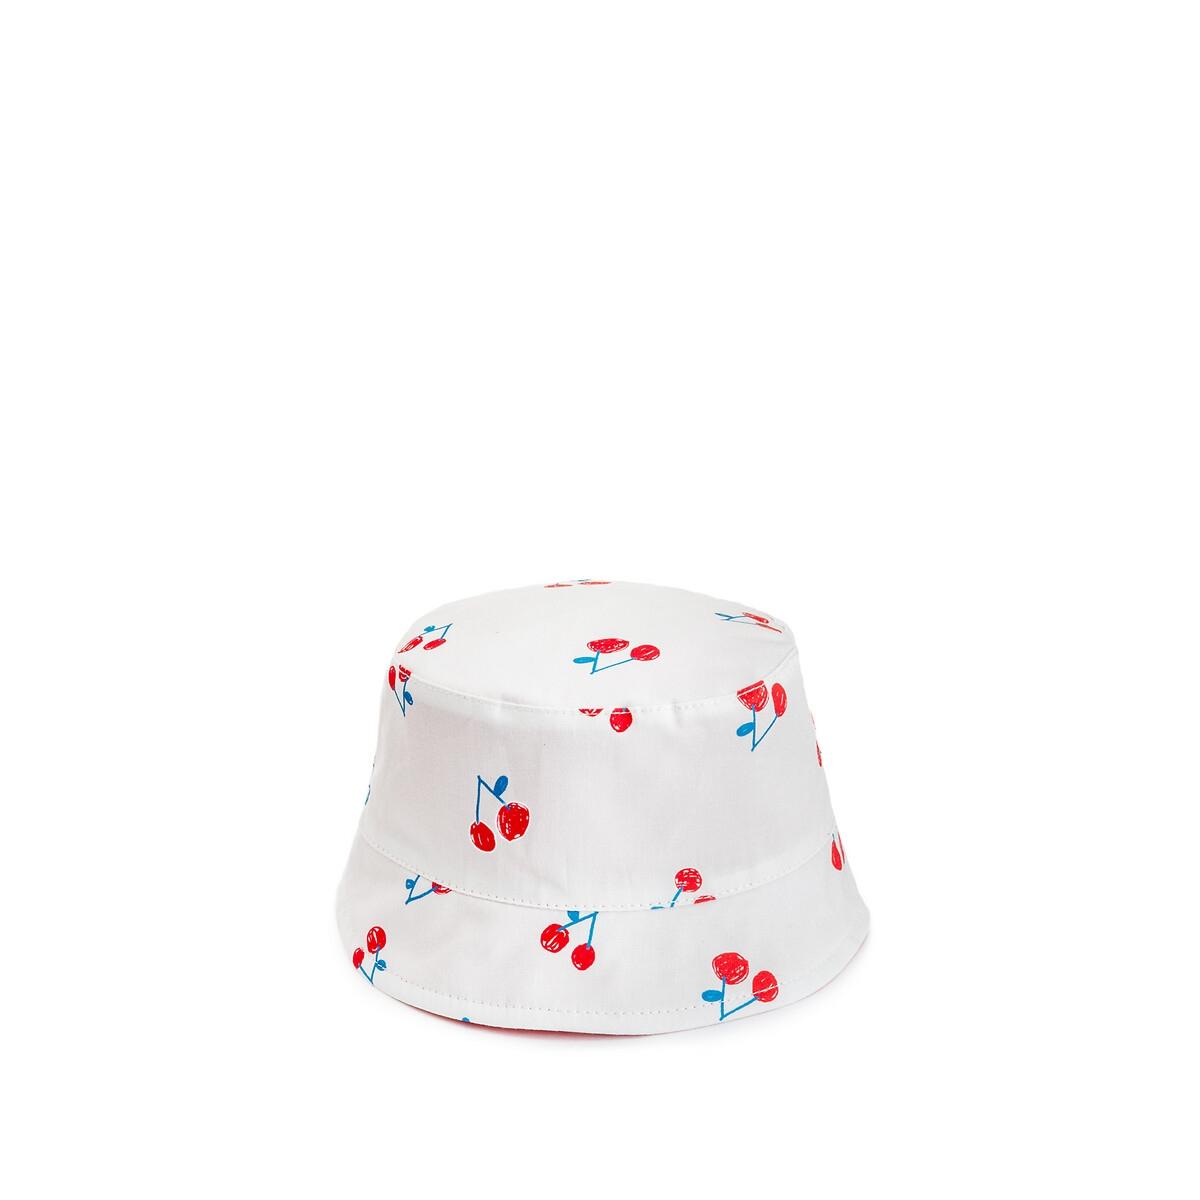 Шляпа LaRedoute Боб двухсторонняя 03 месяца-23 года 2/3 года - 86/94 см зеленый